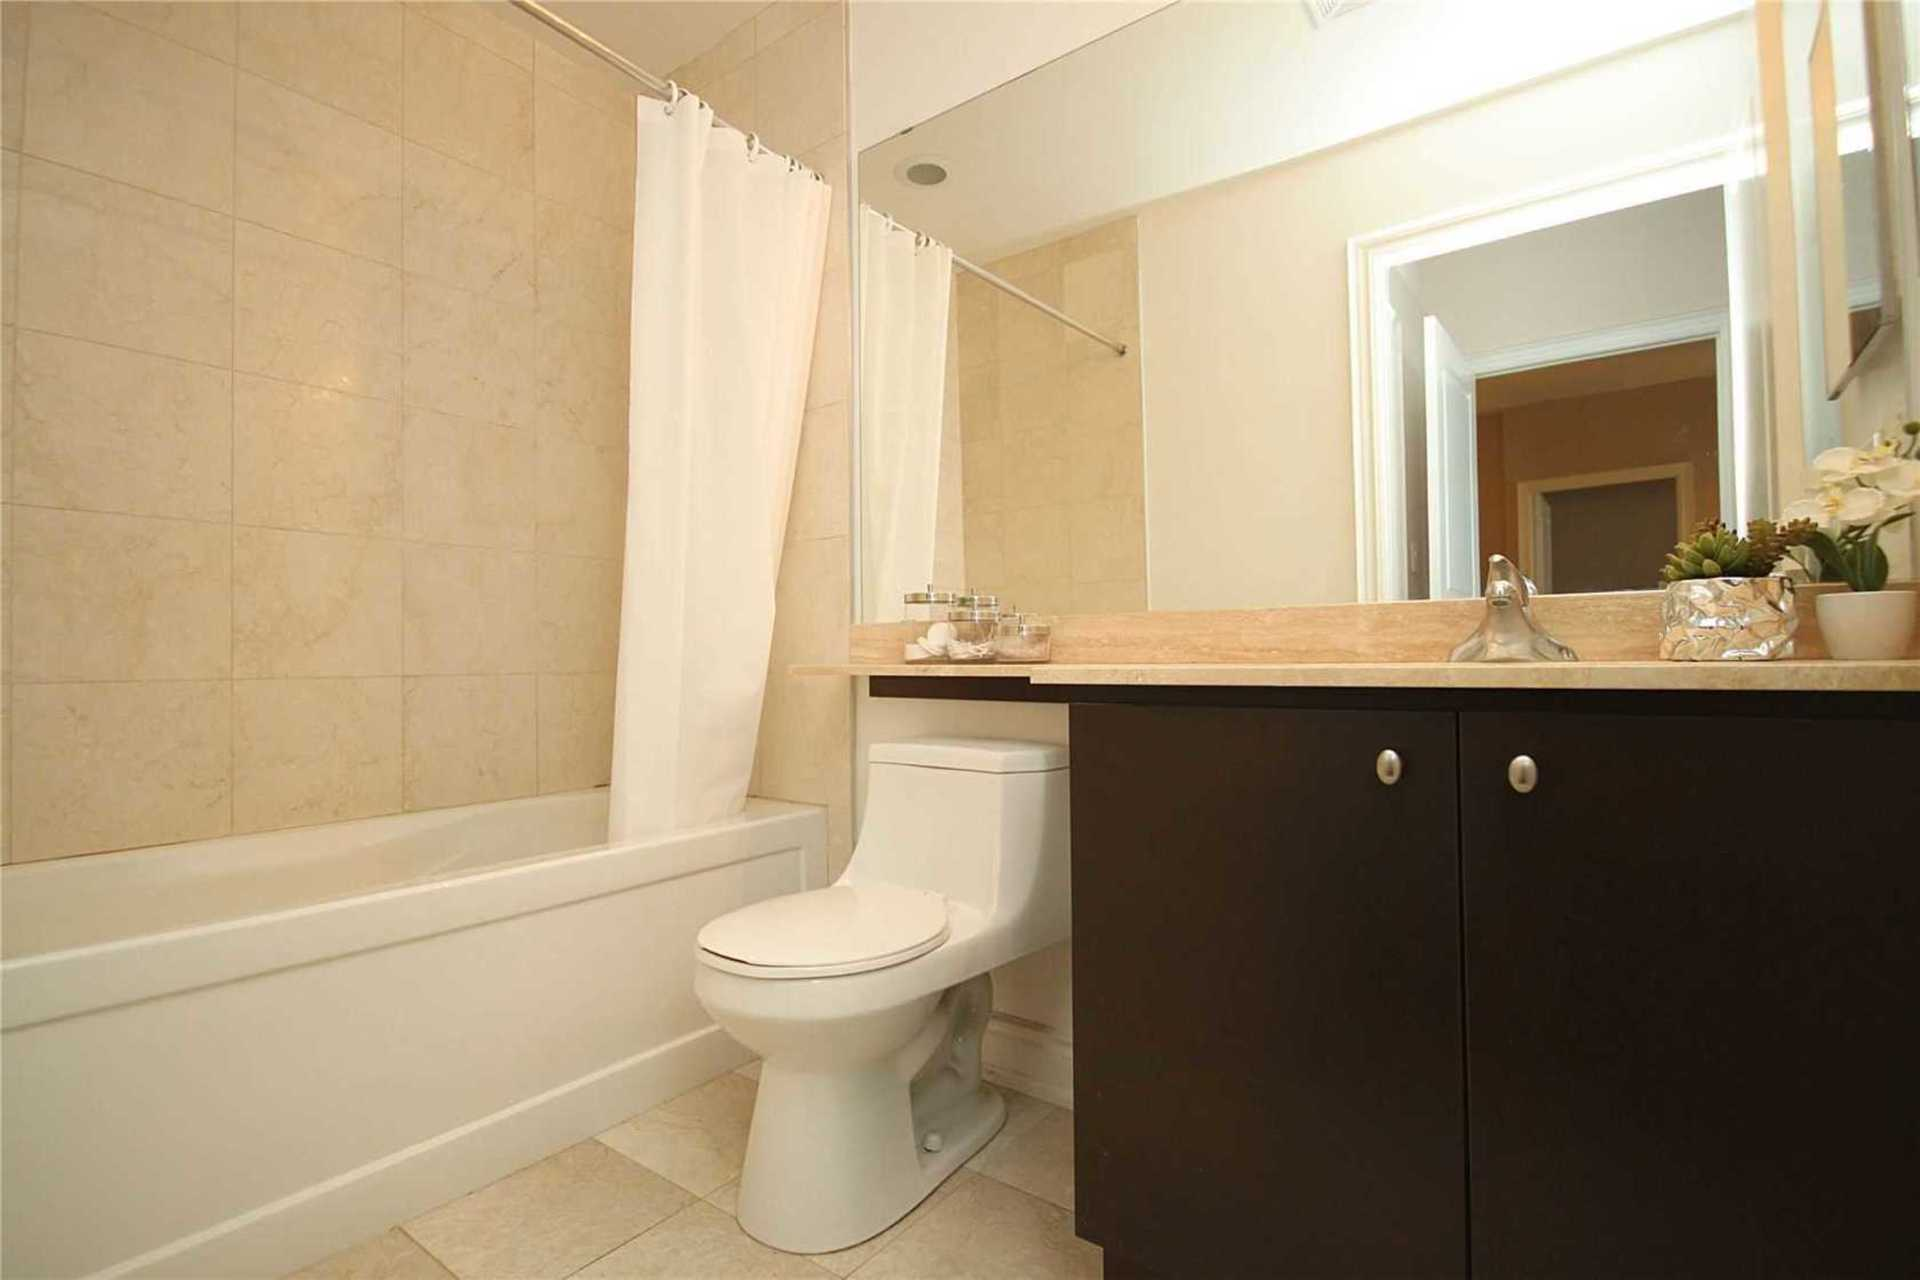 4 Piece Ensuite Bathroom at 1209 - 10 Bloorview Place, Don Valley Village, Toronto